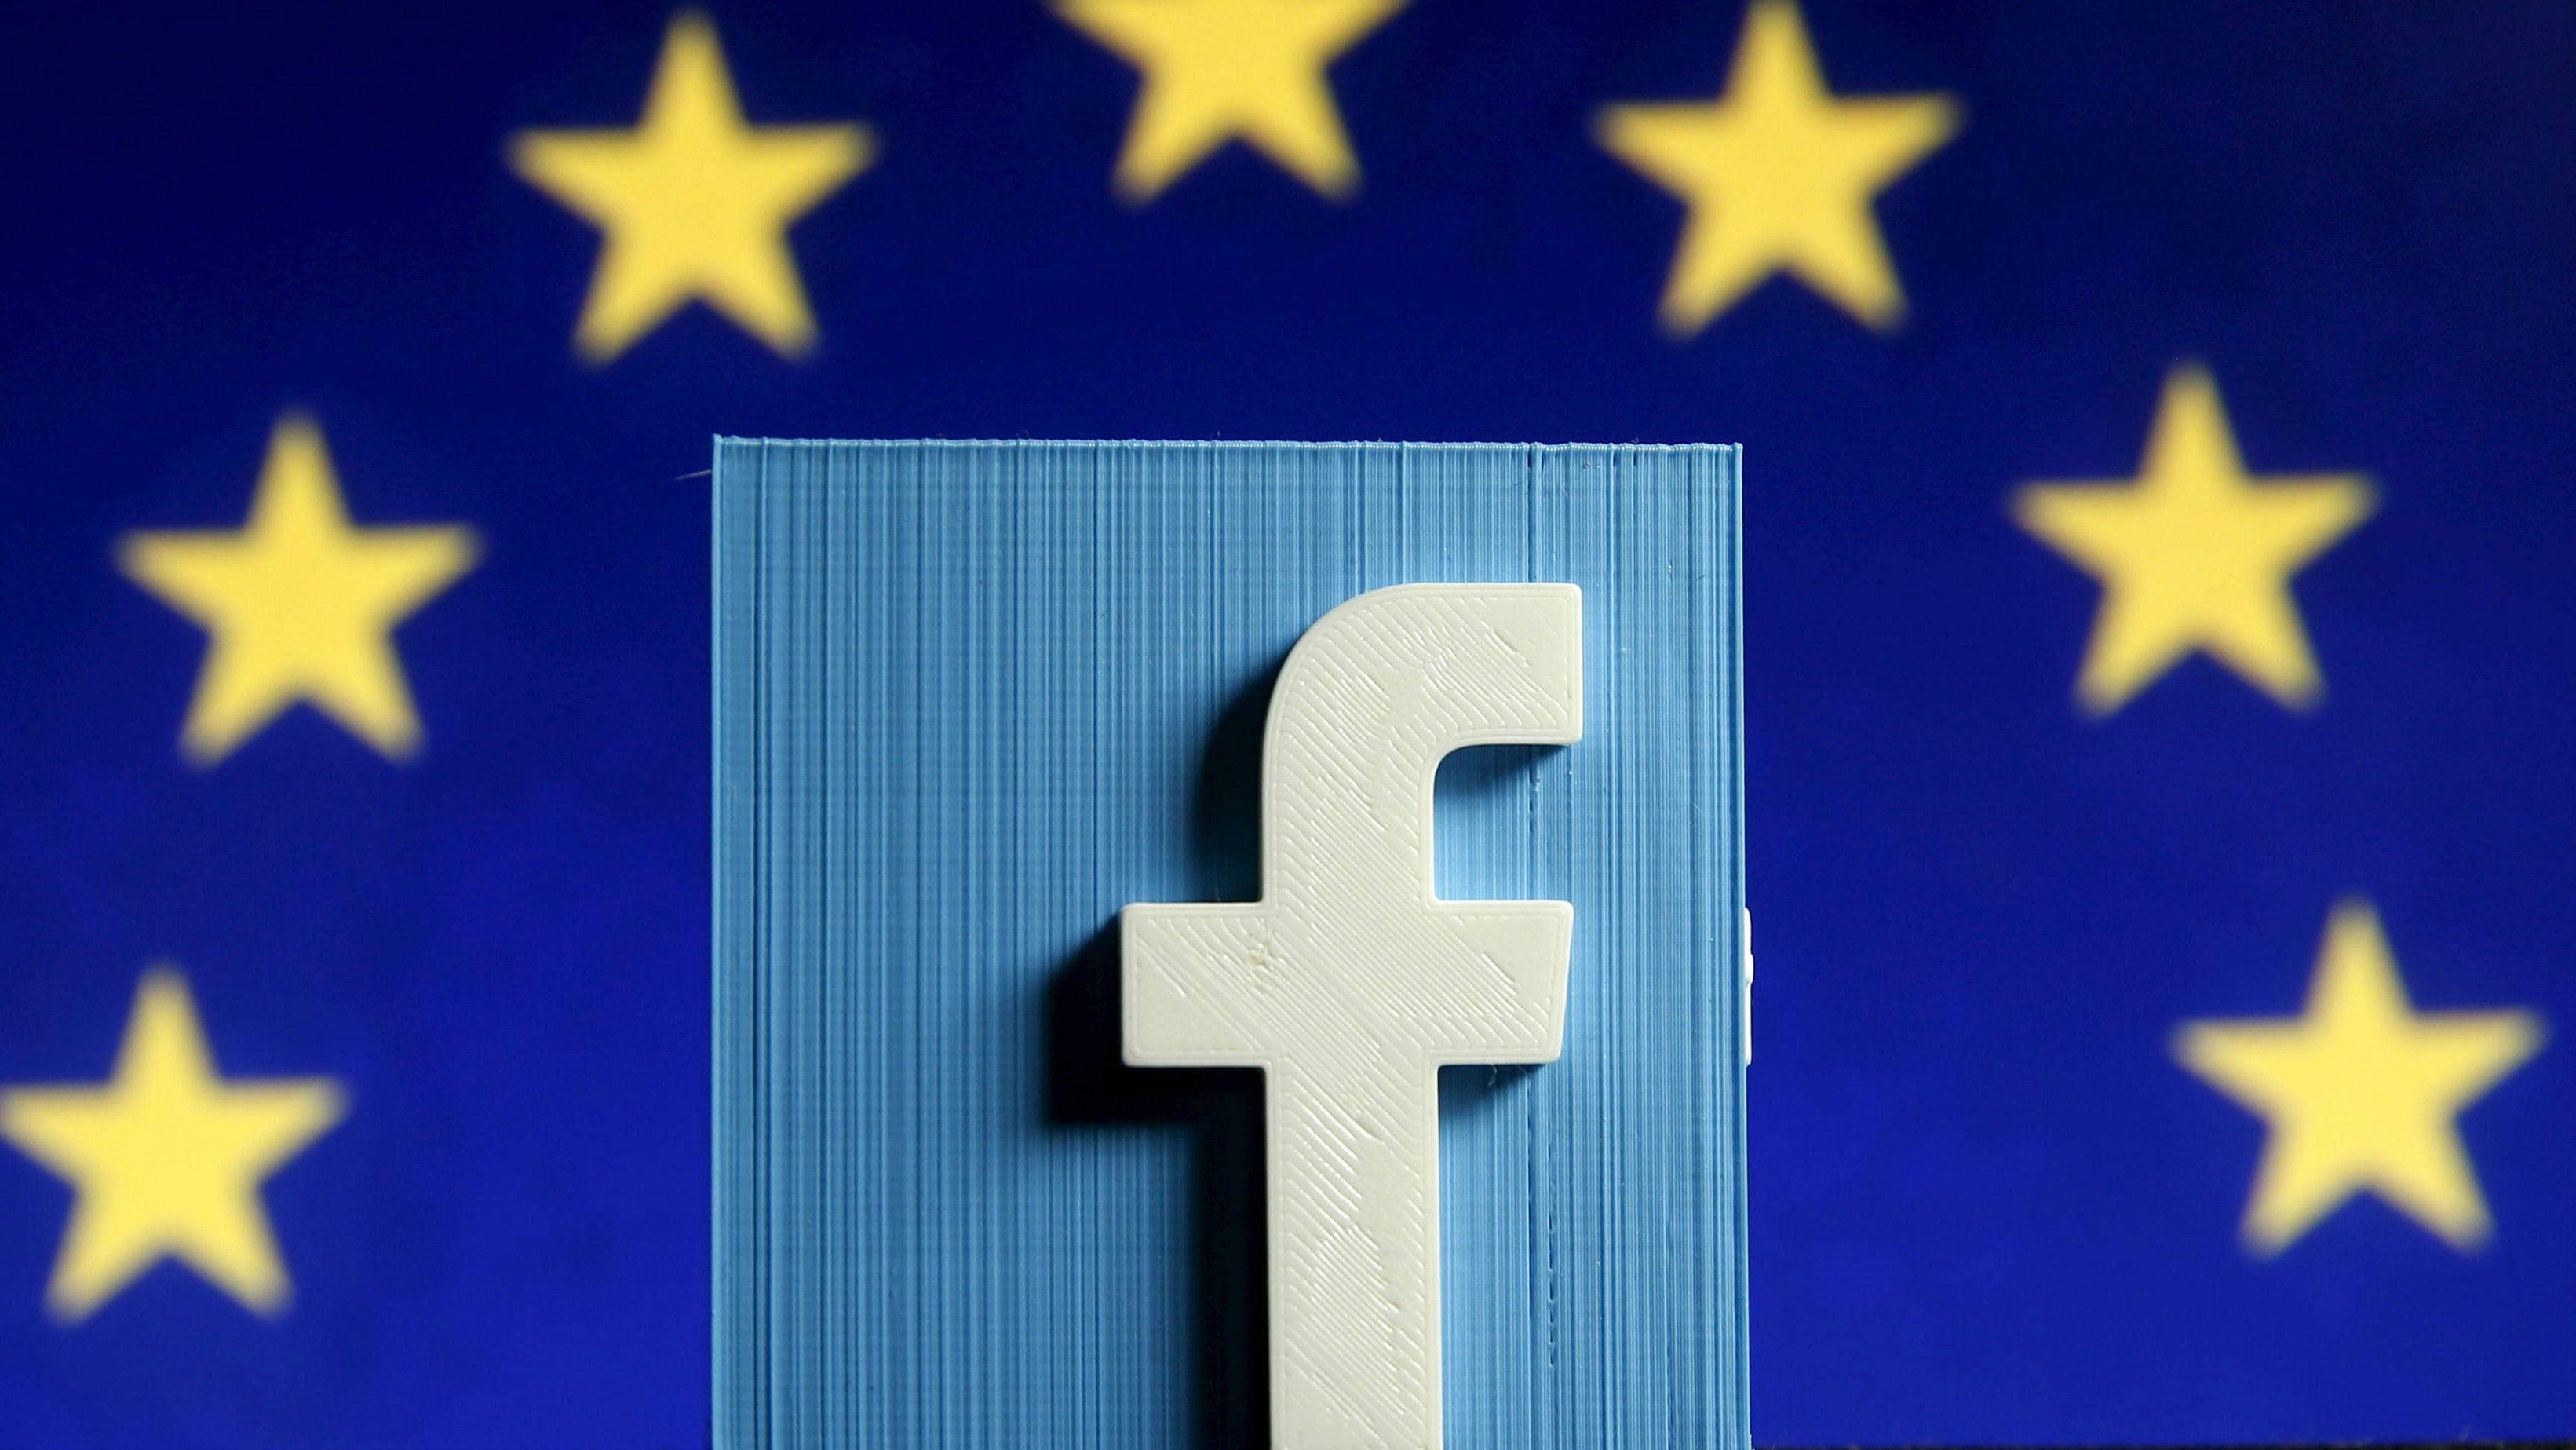 Facebook si adegua in anticipo al GDPR